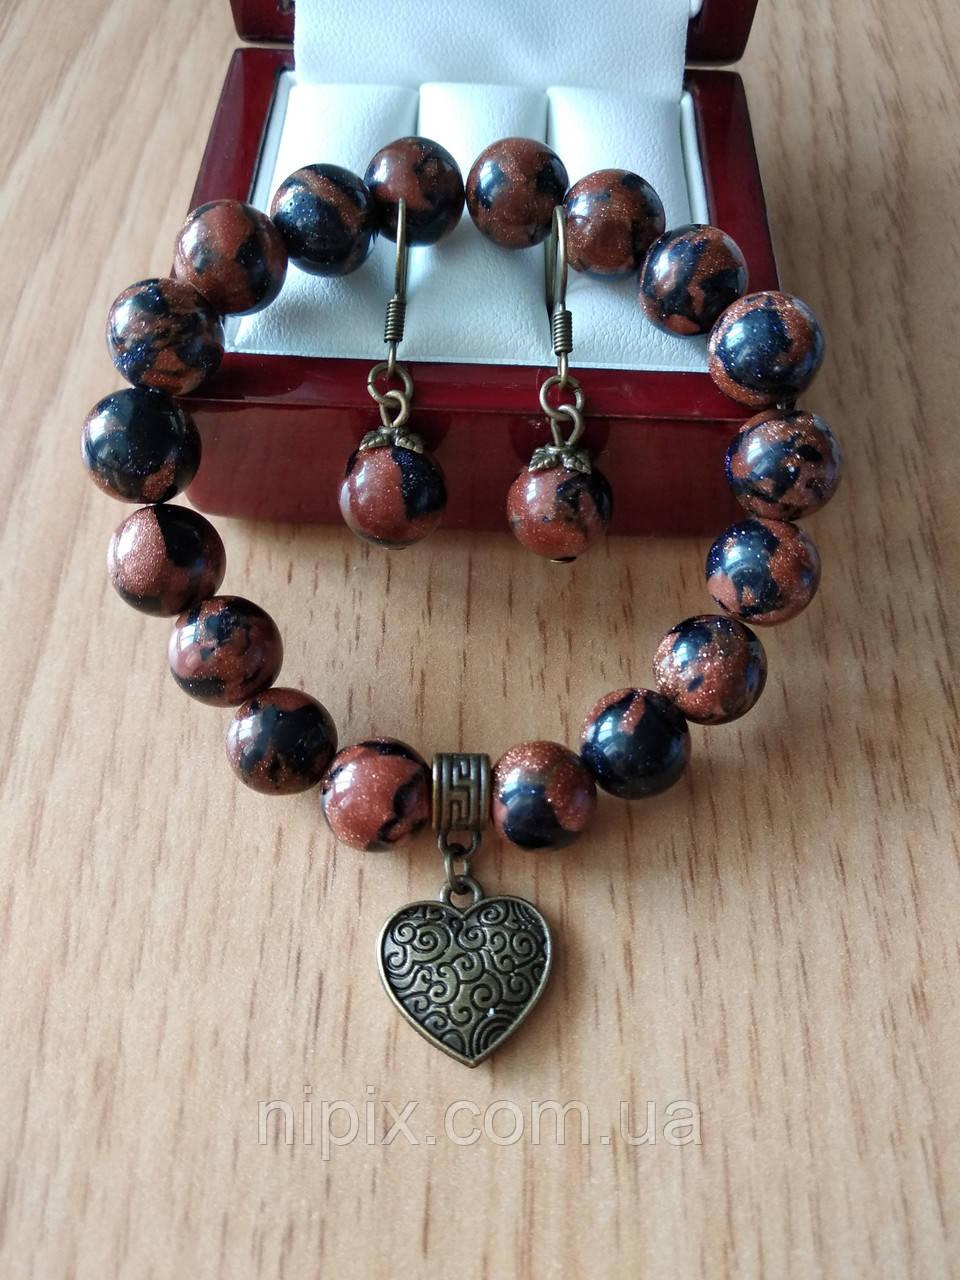 Комплект з натурального синьо-коричневого авантюрину - браслет та сережки